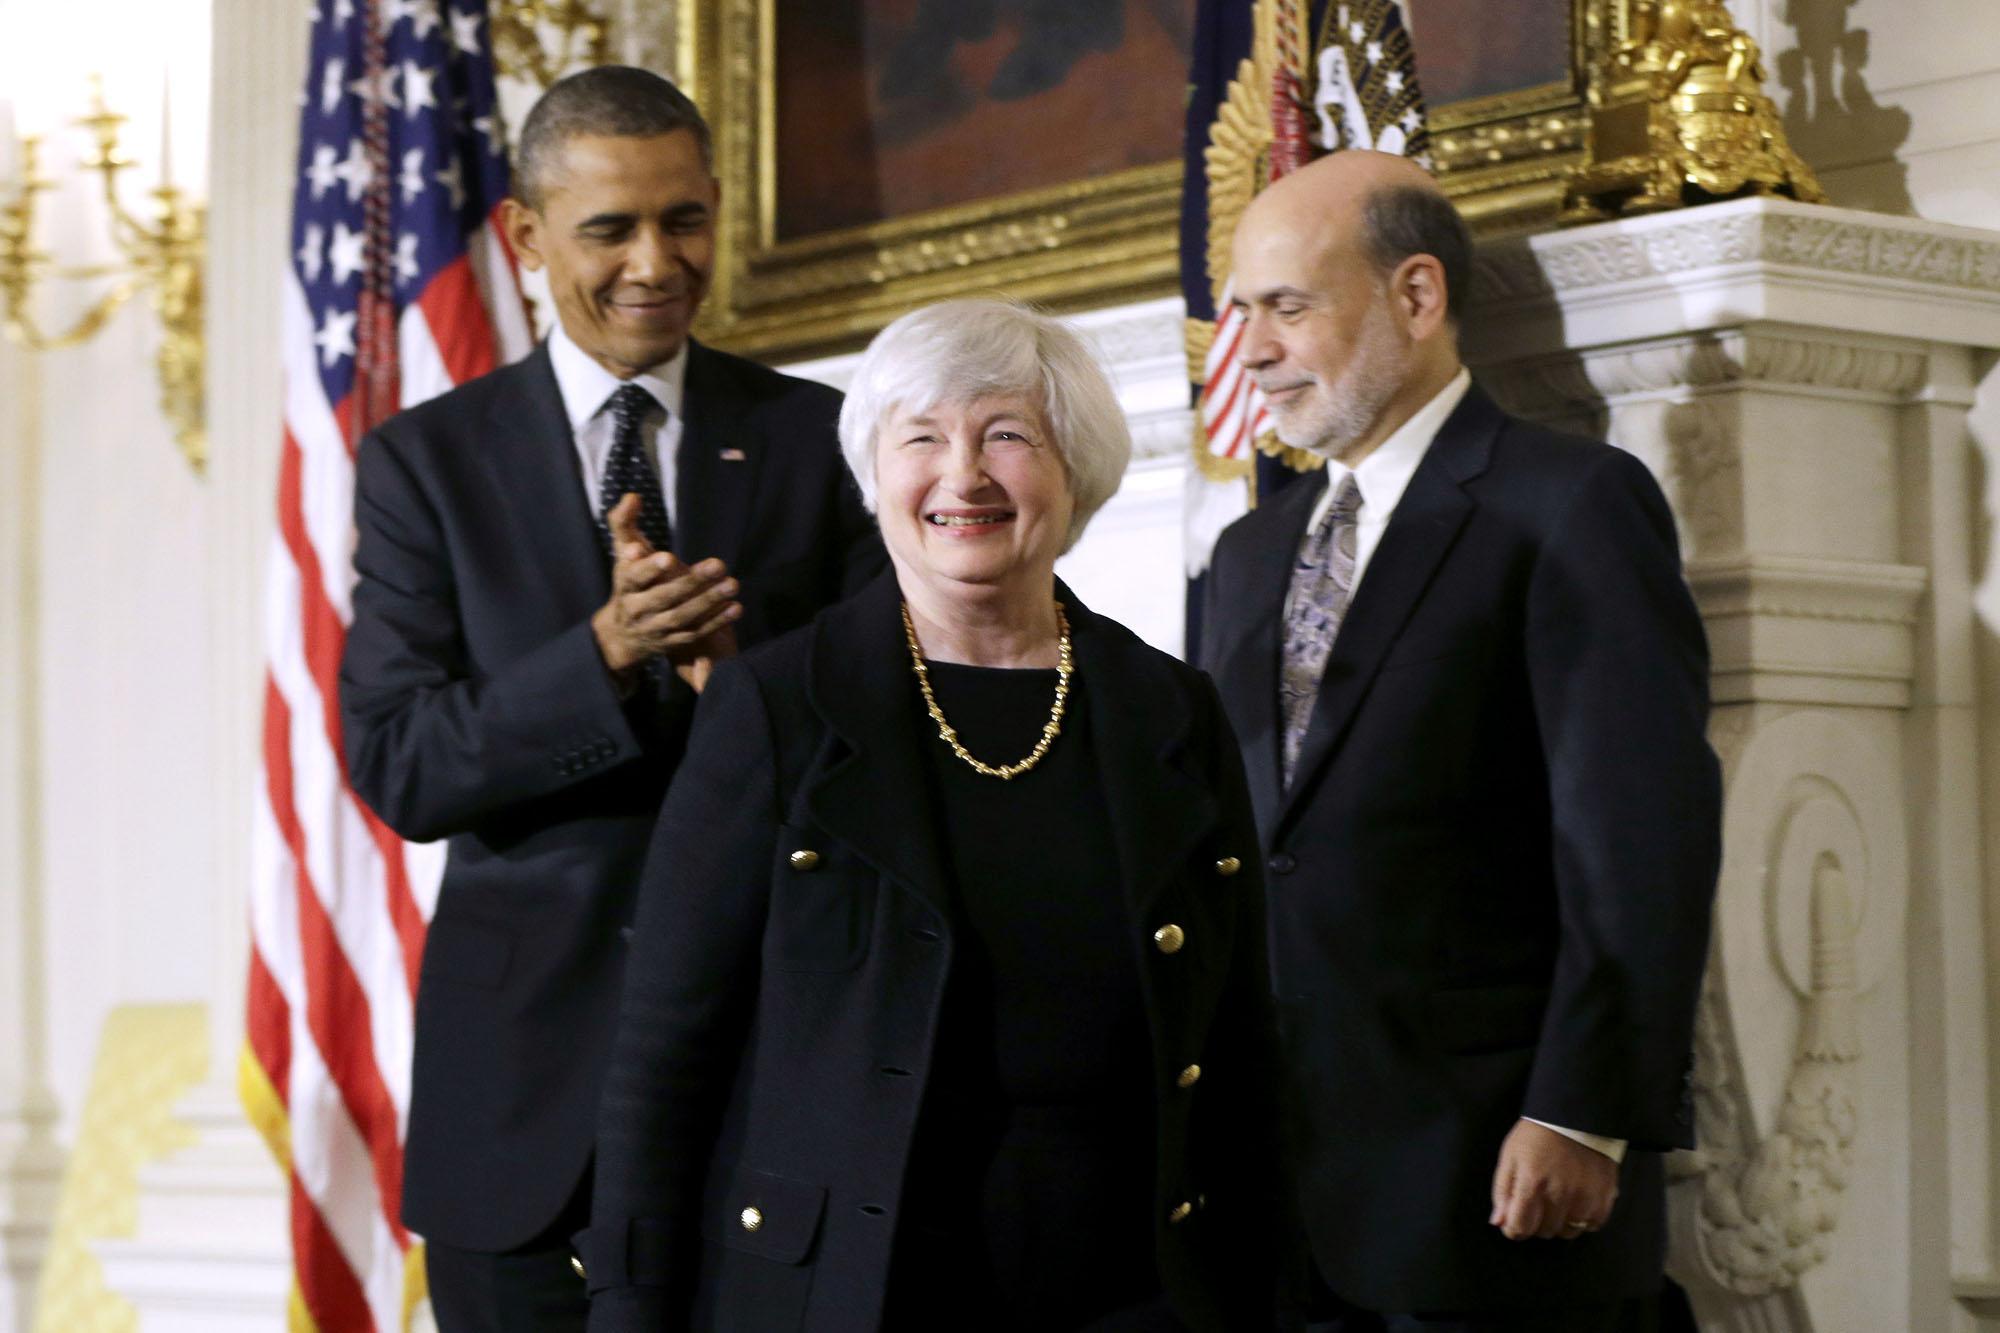 Barack Obama, Ben Bernanke, Janet Yellen